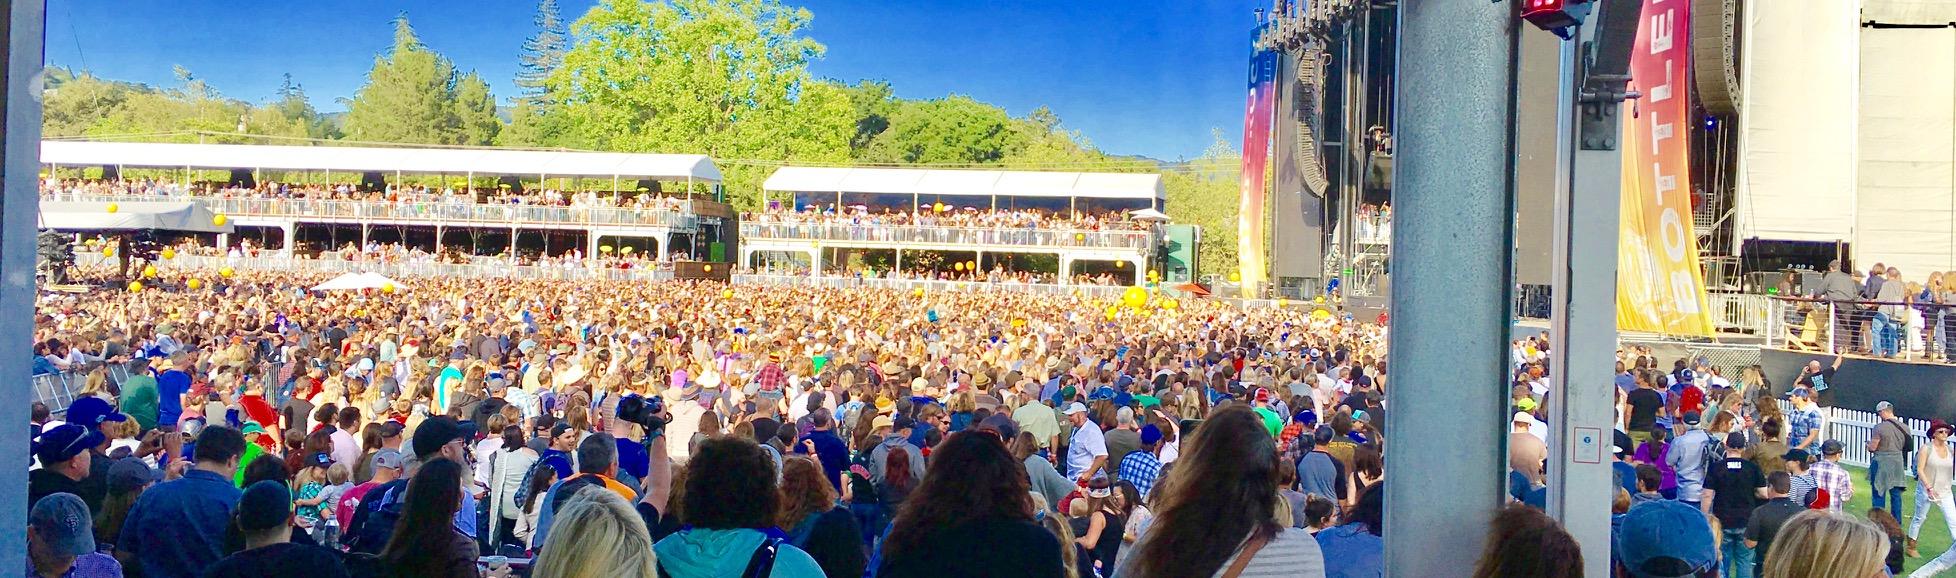 bottlerock crowd